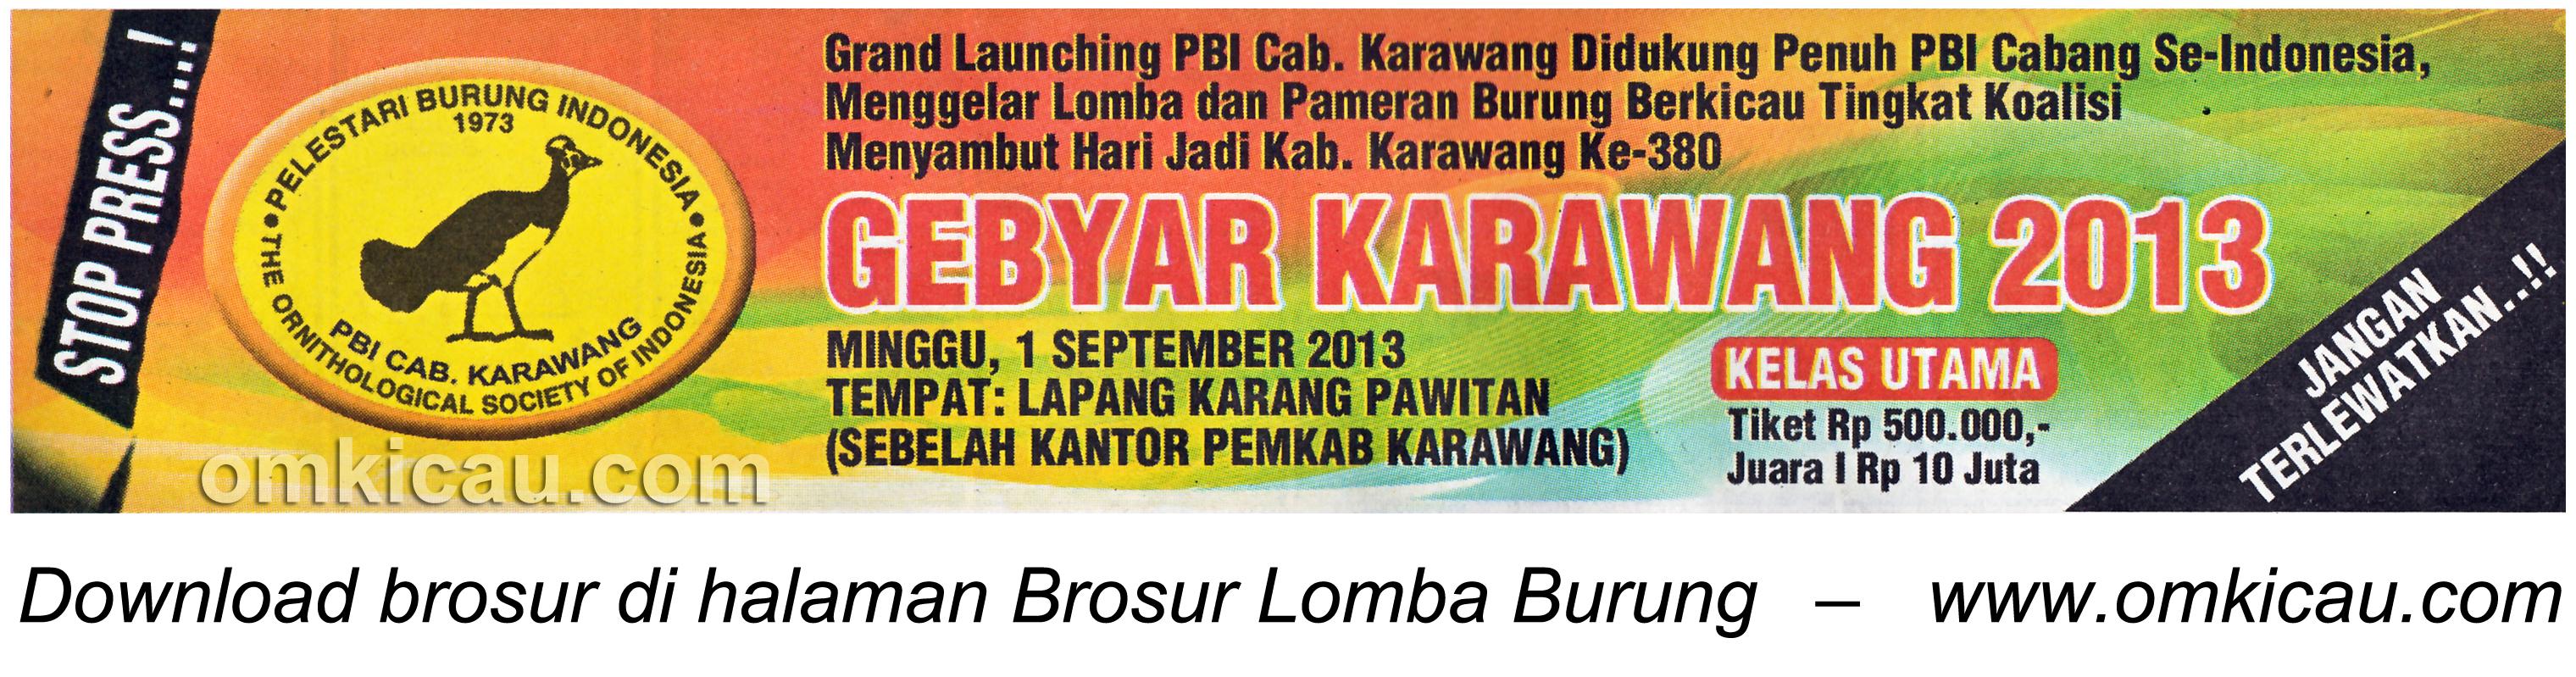 Brosur Lomba Gebyar Karawang 1 September 2013